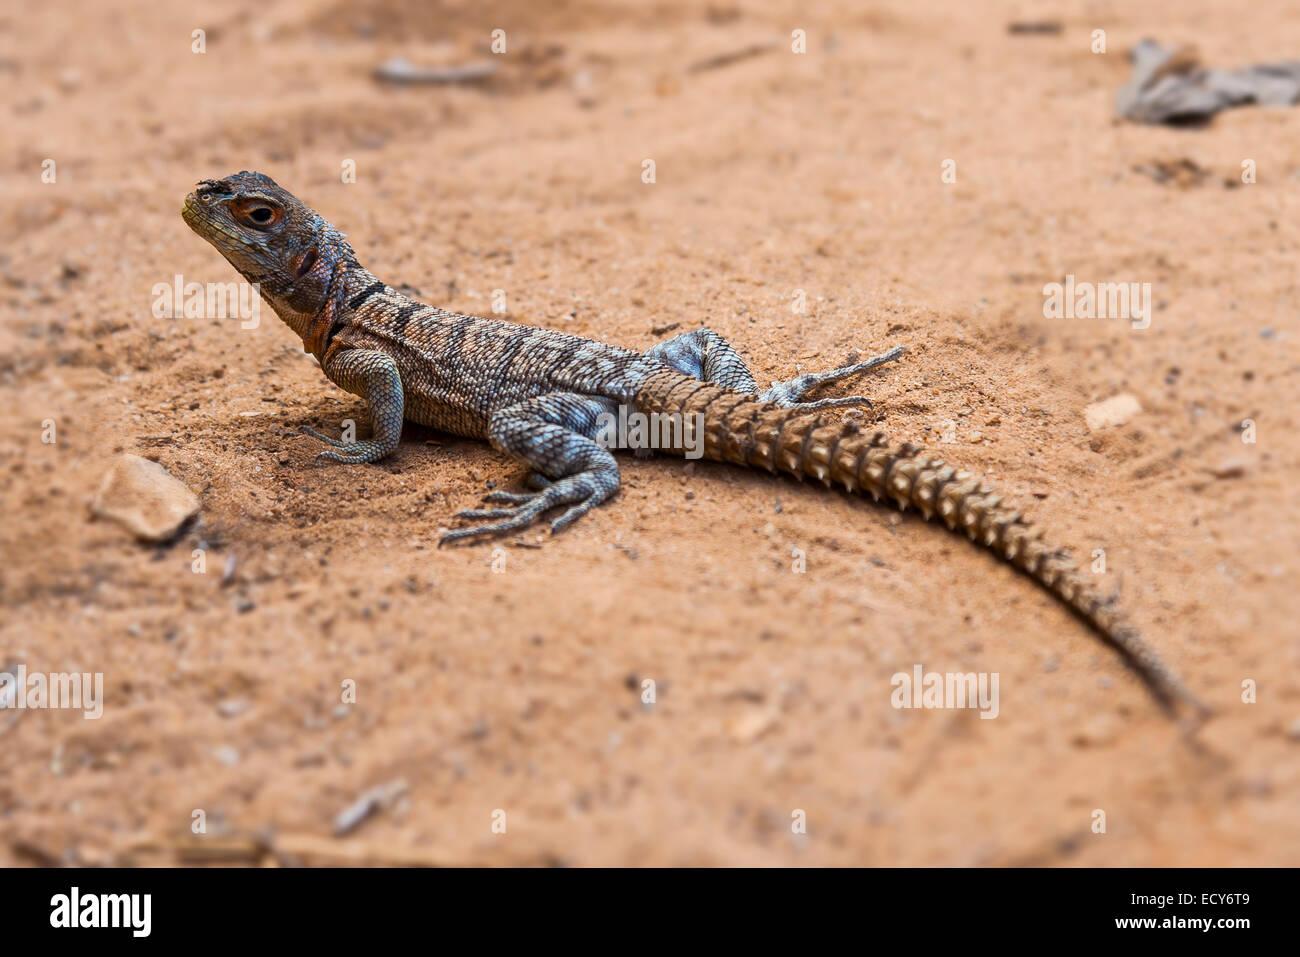 Iguanid Lizard, Collared Iguana, or Madagascan Collared Iguana (Opulurus cuvieri), Kirindy, Madagascar - Stock Image